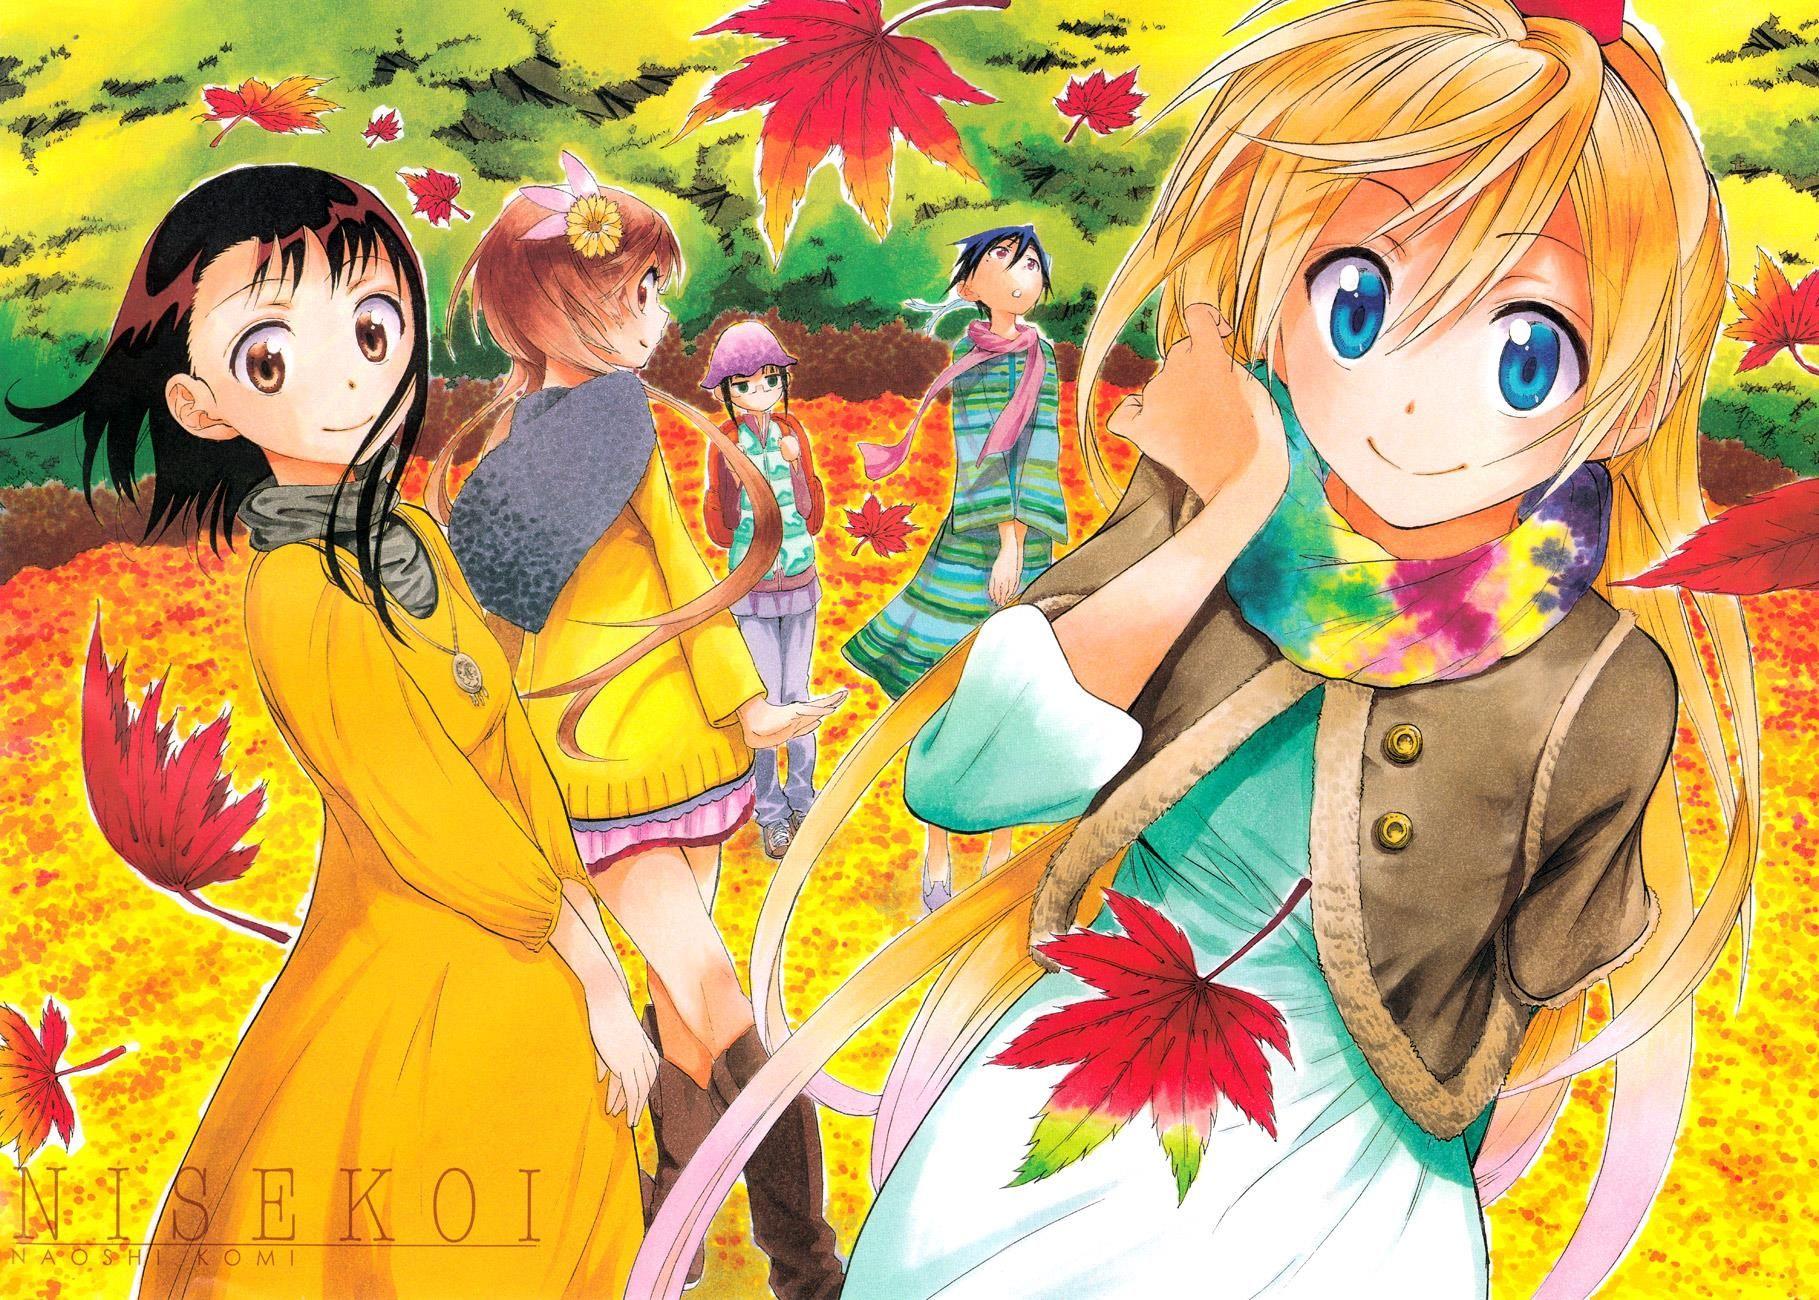 NISEKOI (With images) Nisekoi, Nisekoi manga, Anime